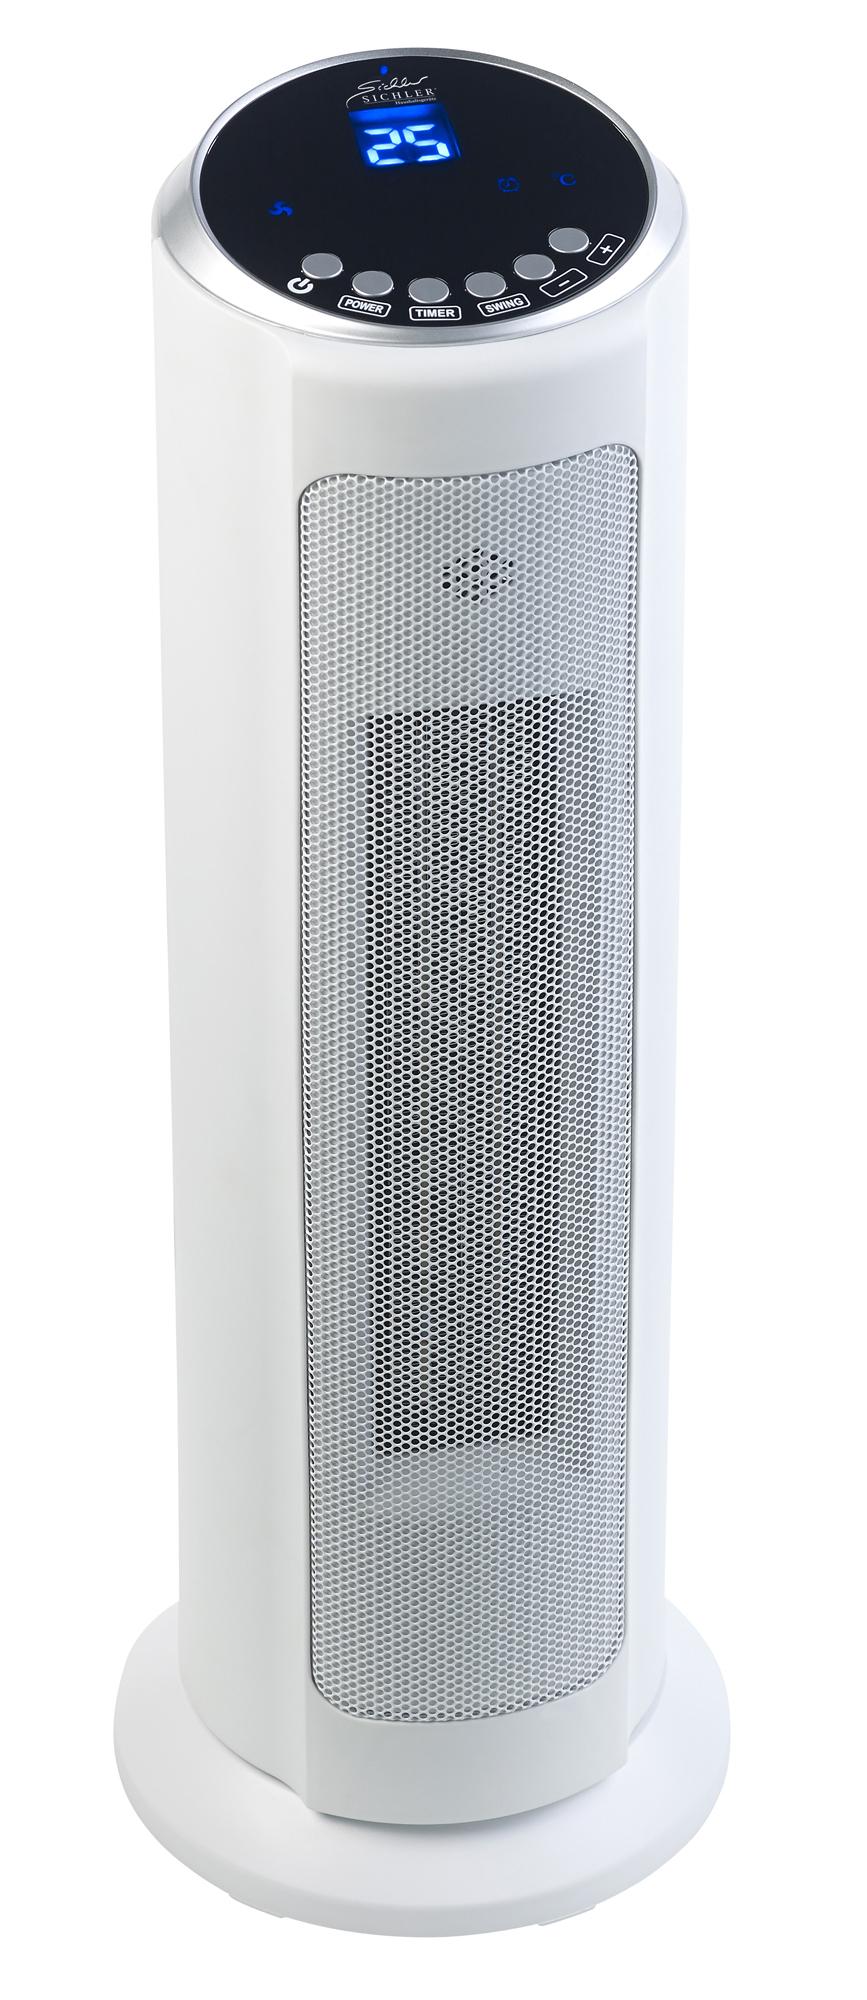 Sichler Heizlüfter LV-850.avs, kompatibel zu Amazon Alexa & Google Assistant.